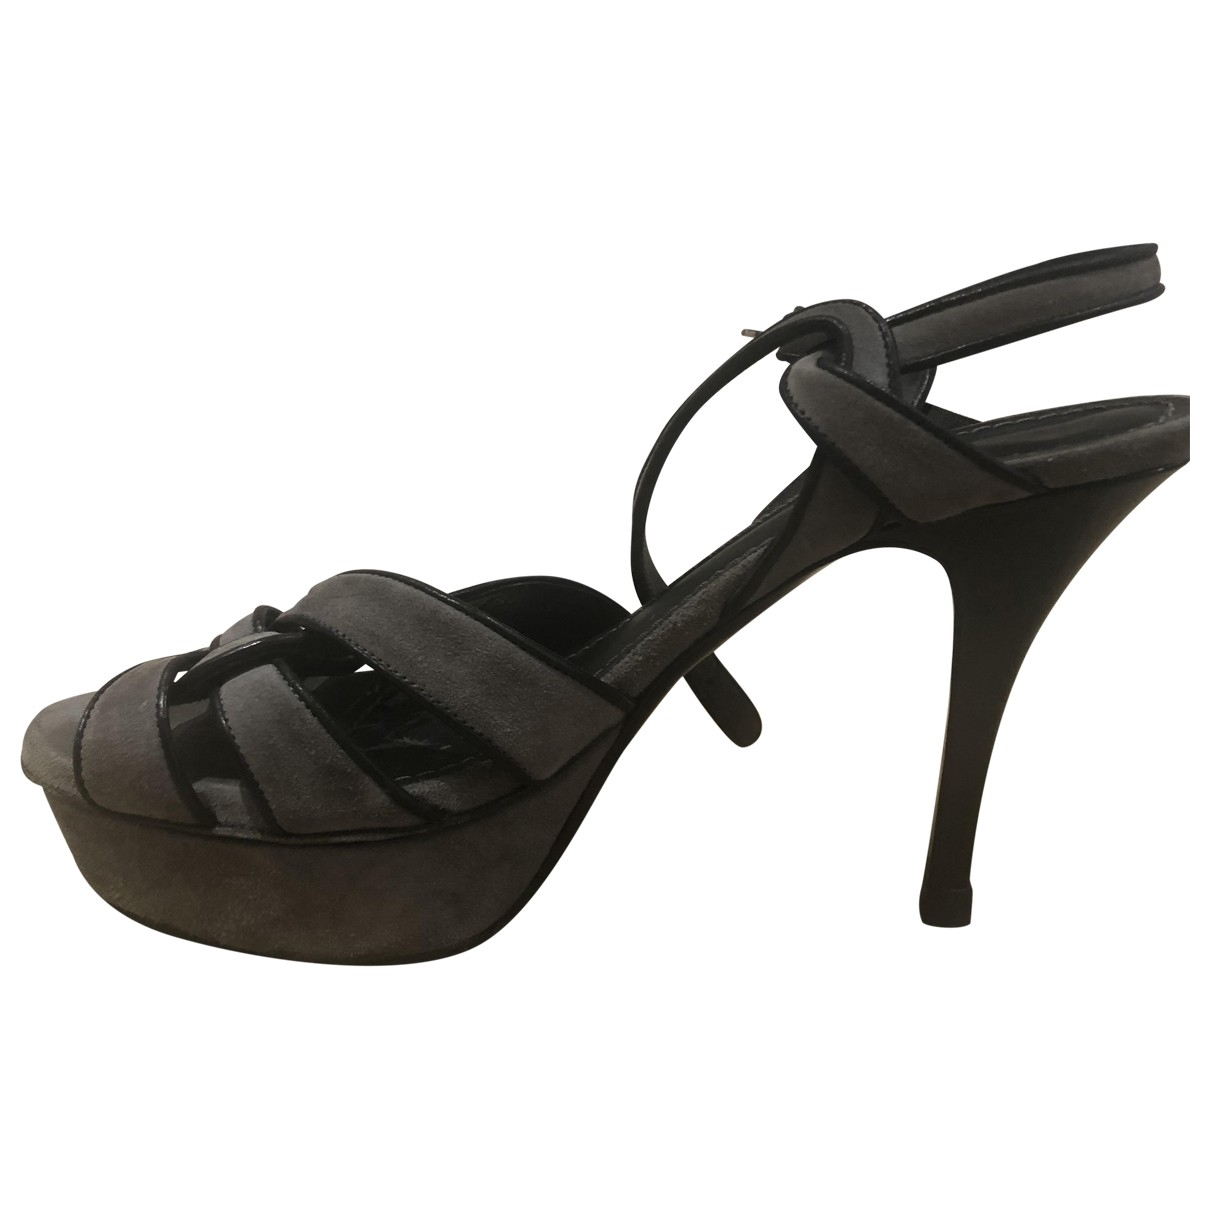 Yves Saint Laurent Tribute Grey Suede Sandals for Women 37 EU